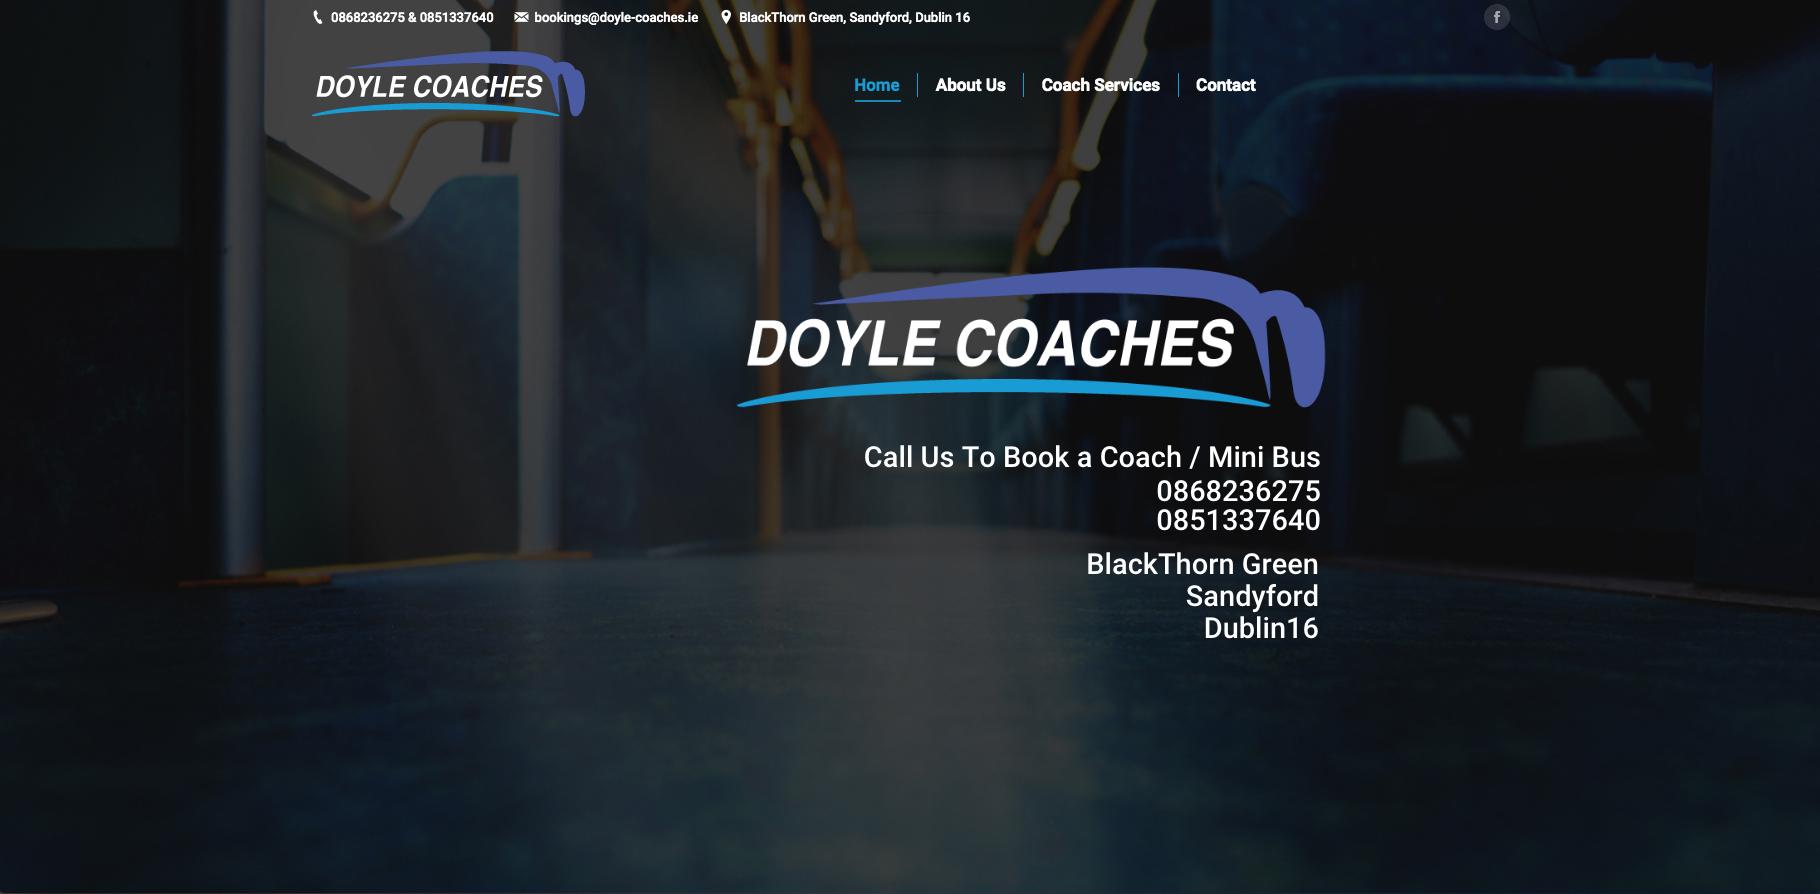 Doyle Coaches